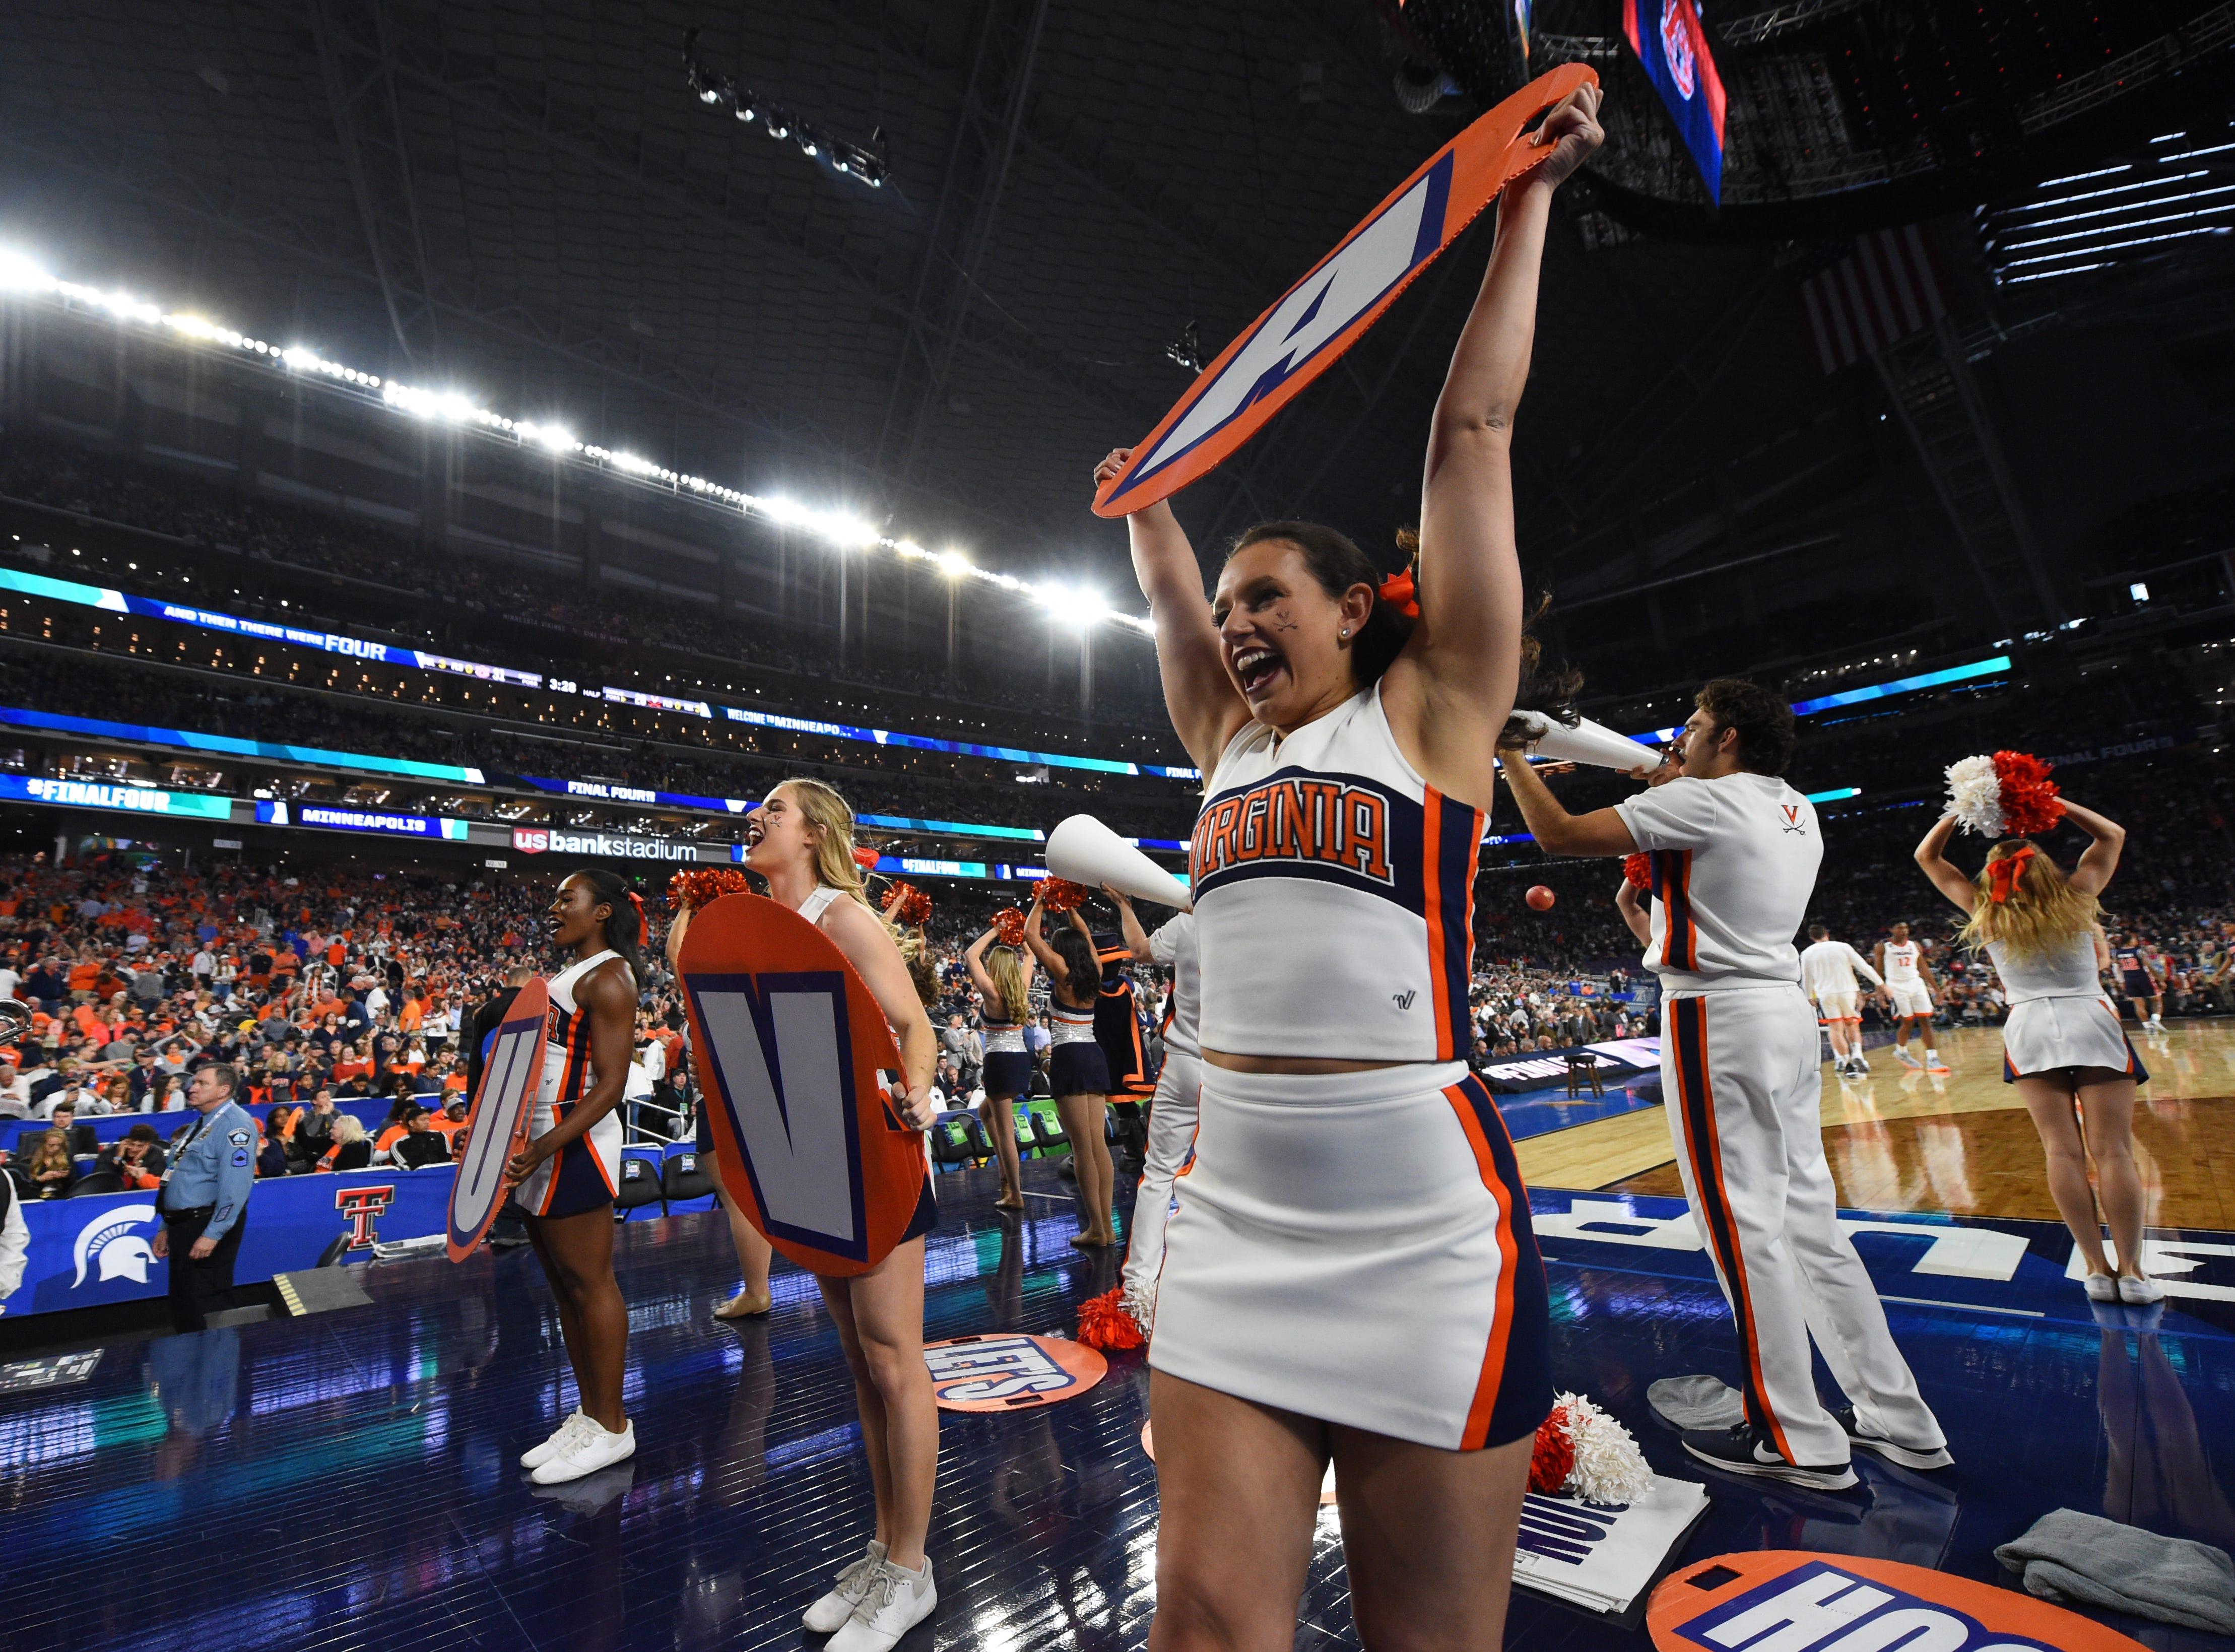 Final Four: Virginia Cavaliers cheerleaders perform during halftime against the Auburn Tigers.